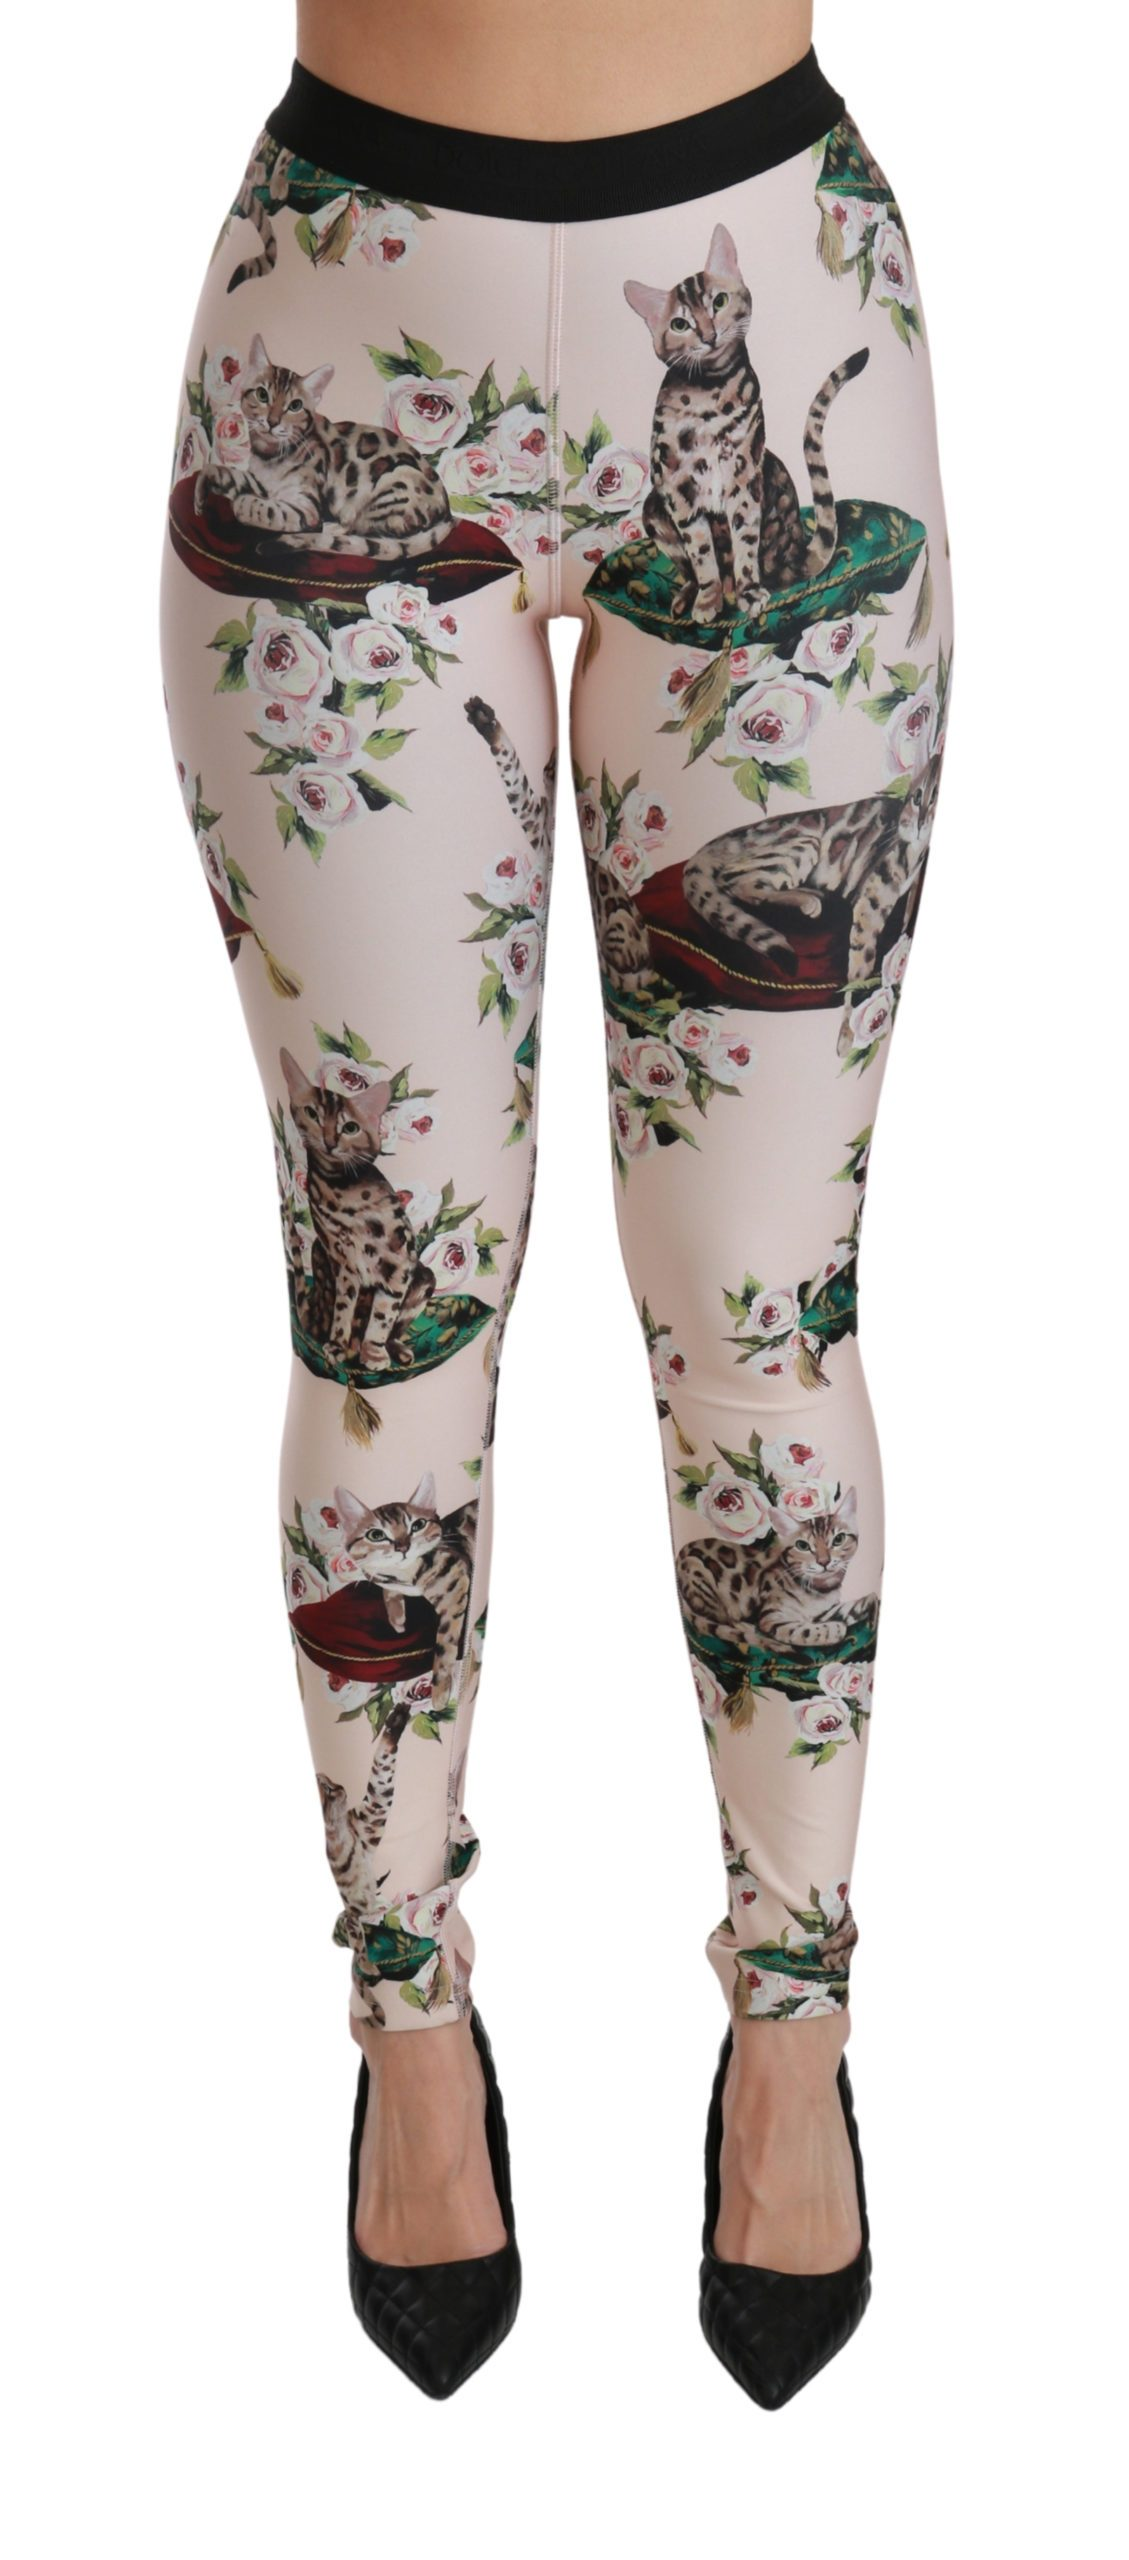 Dolce & Gabbana Women's Floral Bengal Cat Leggings Trouser Multicolor PAN70812 - IT36   XS